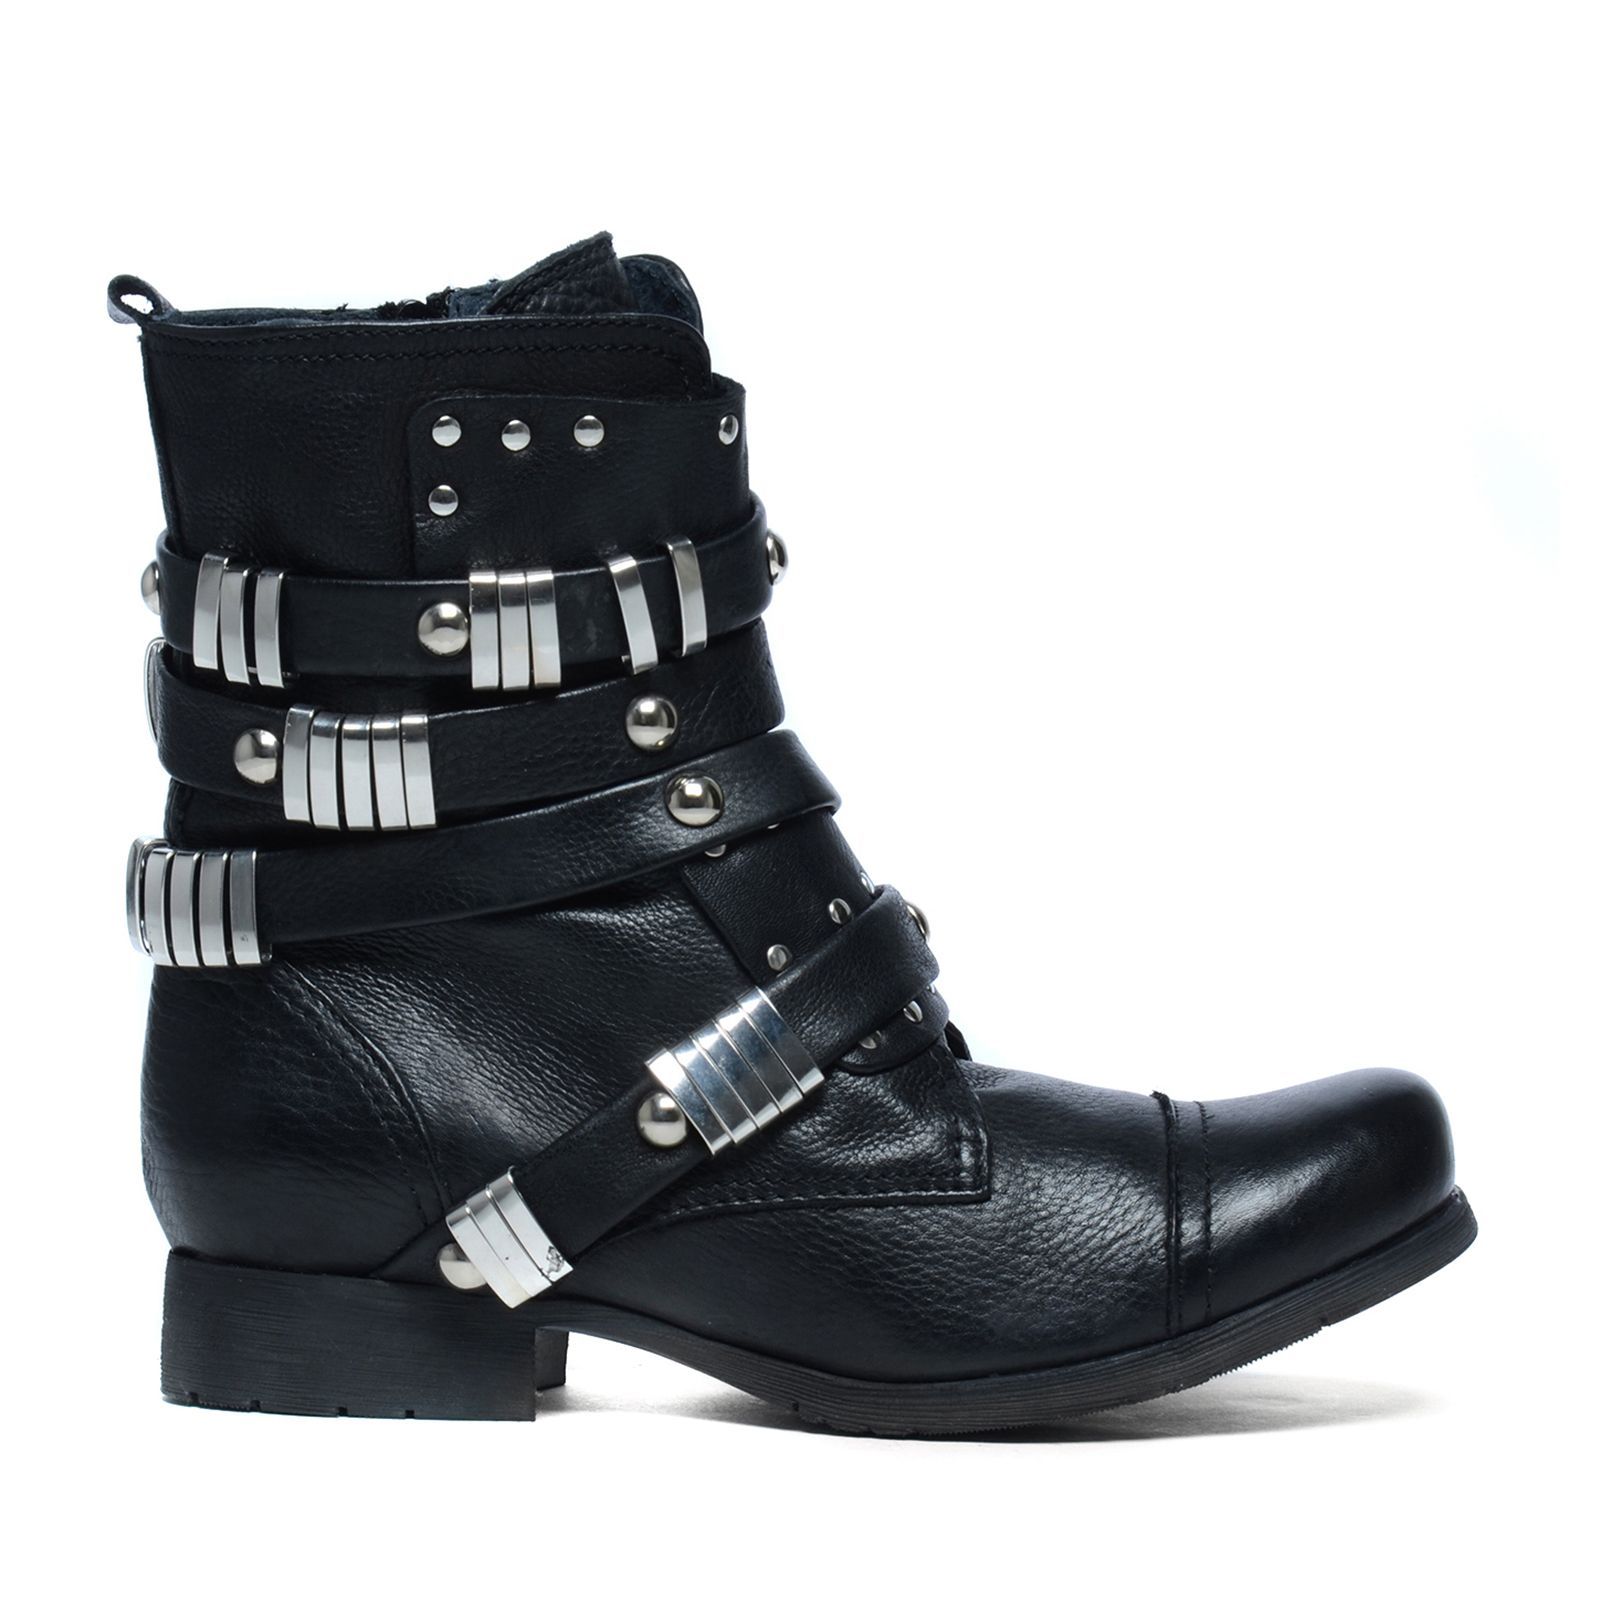 Sacha x Fashionchick bottines avec clous - noir (36,37,38,39,40,41,42)